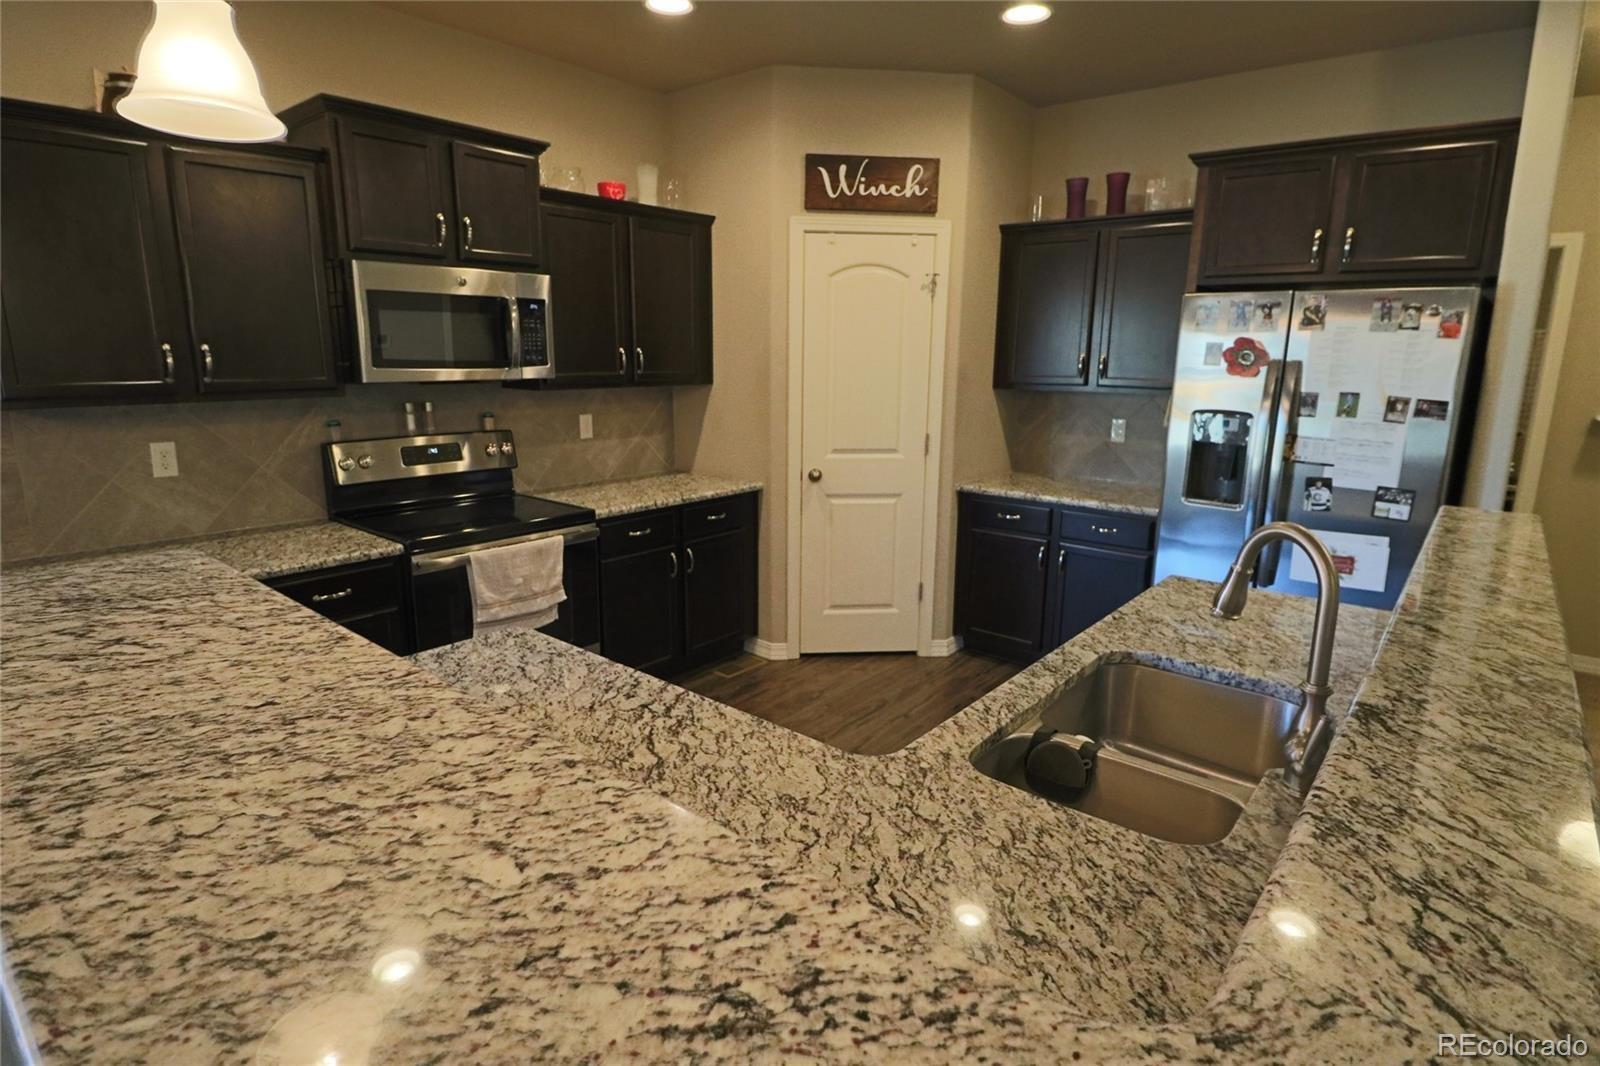 MLS# 4464685 - 9 - 10827 Hidden Prairie Parkway, Fountain, CO 80817